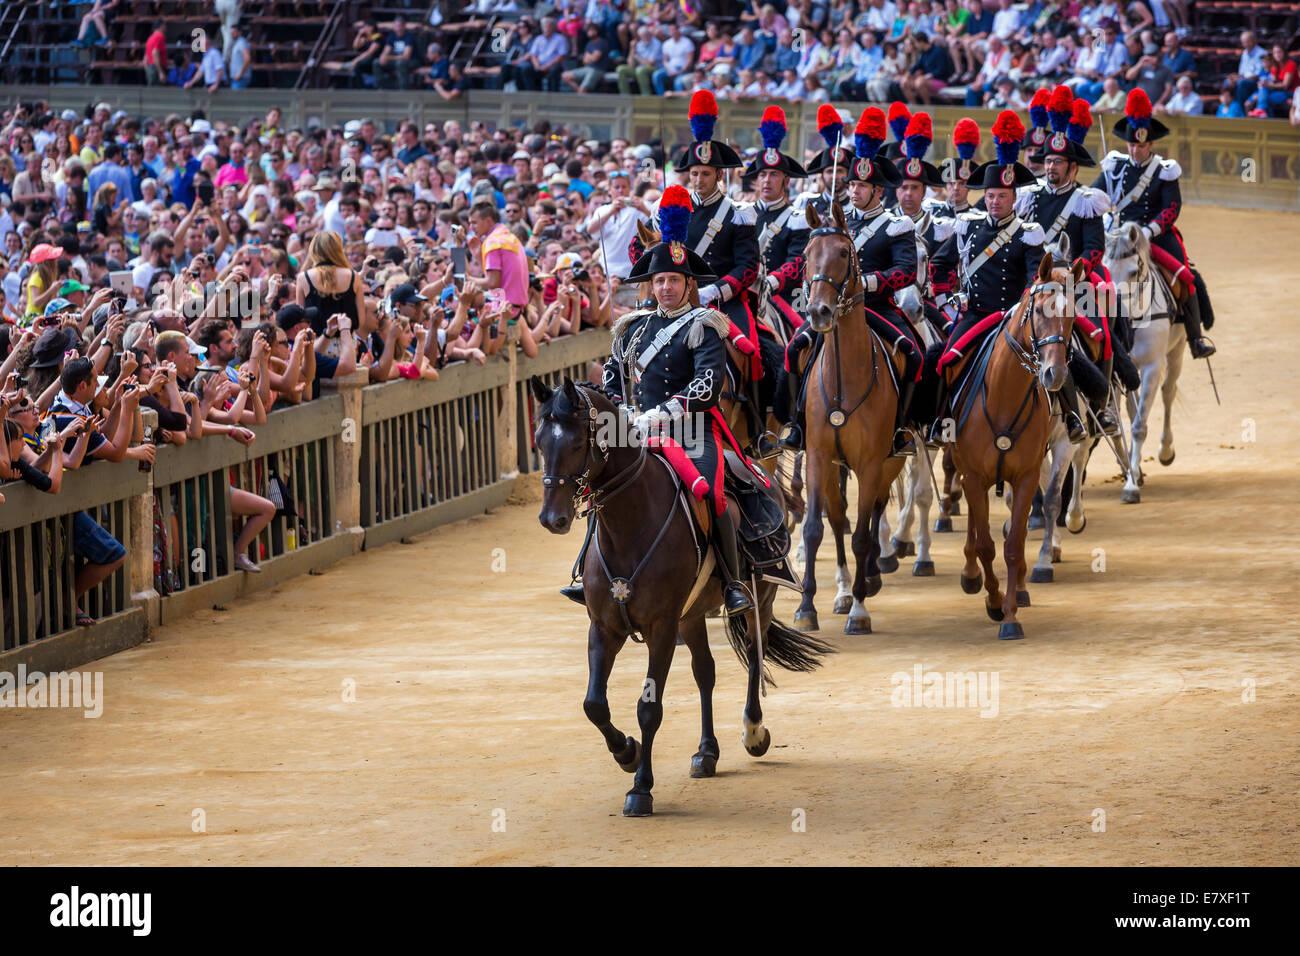 Cavalry parade by the carabinieri, Palio di Siena, historical parade, Siena, Tuscany, Italy - Stock Image